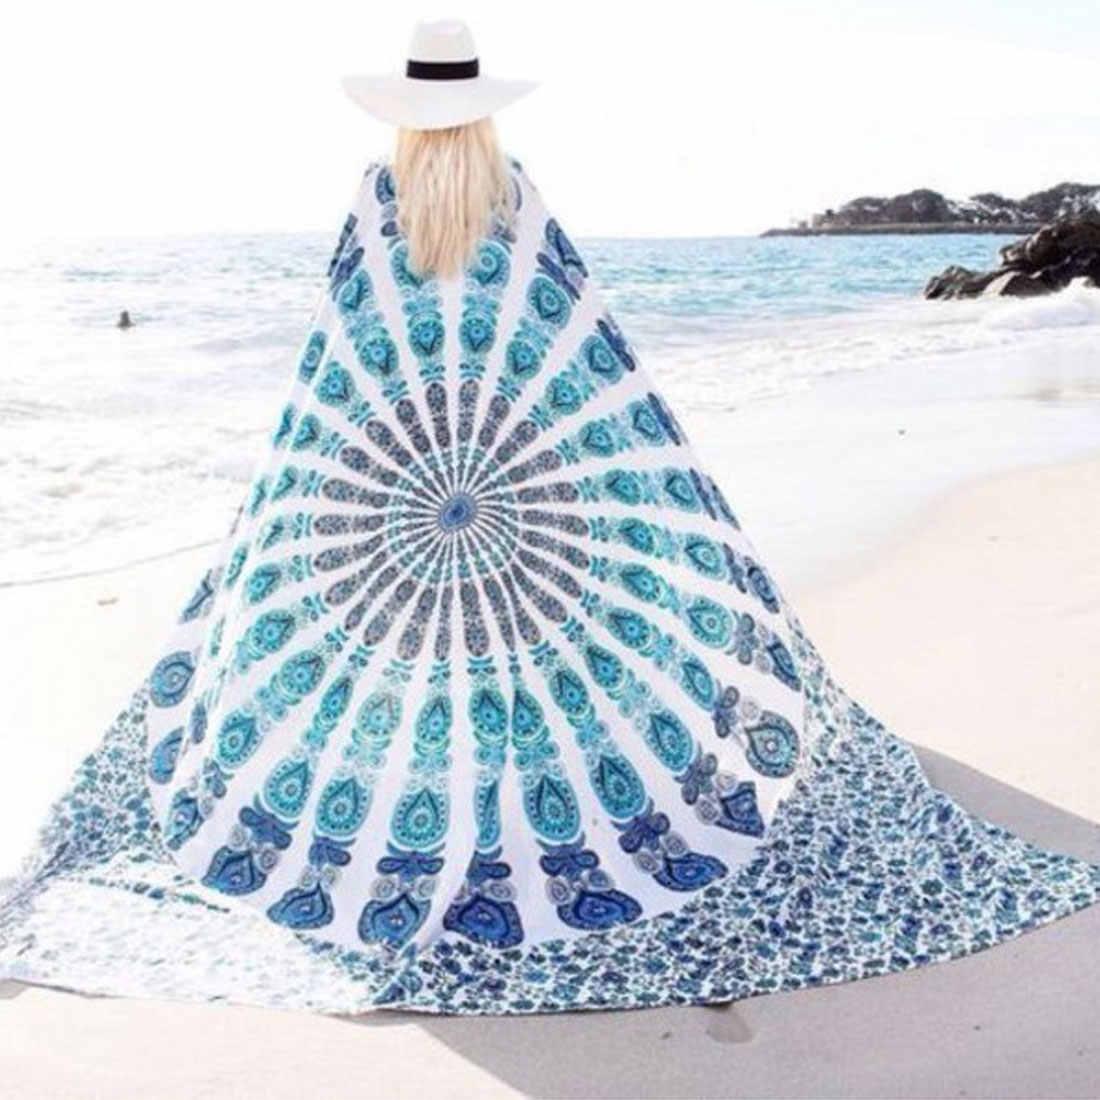 1 Pc النساء حمام شمس اللباس منشفة استحمام الصيف حمام شمس جولة مناشف الشاطئ البوهيمي نمط طباعة بطانية اليوغا حصيرة